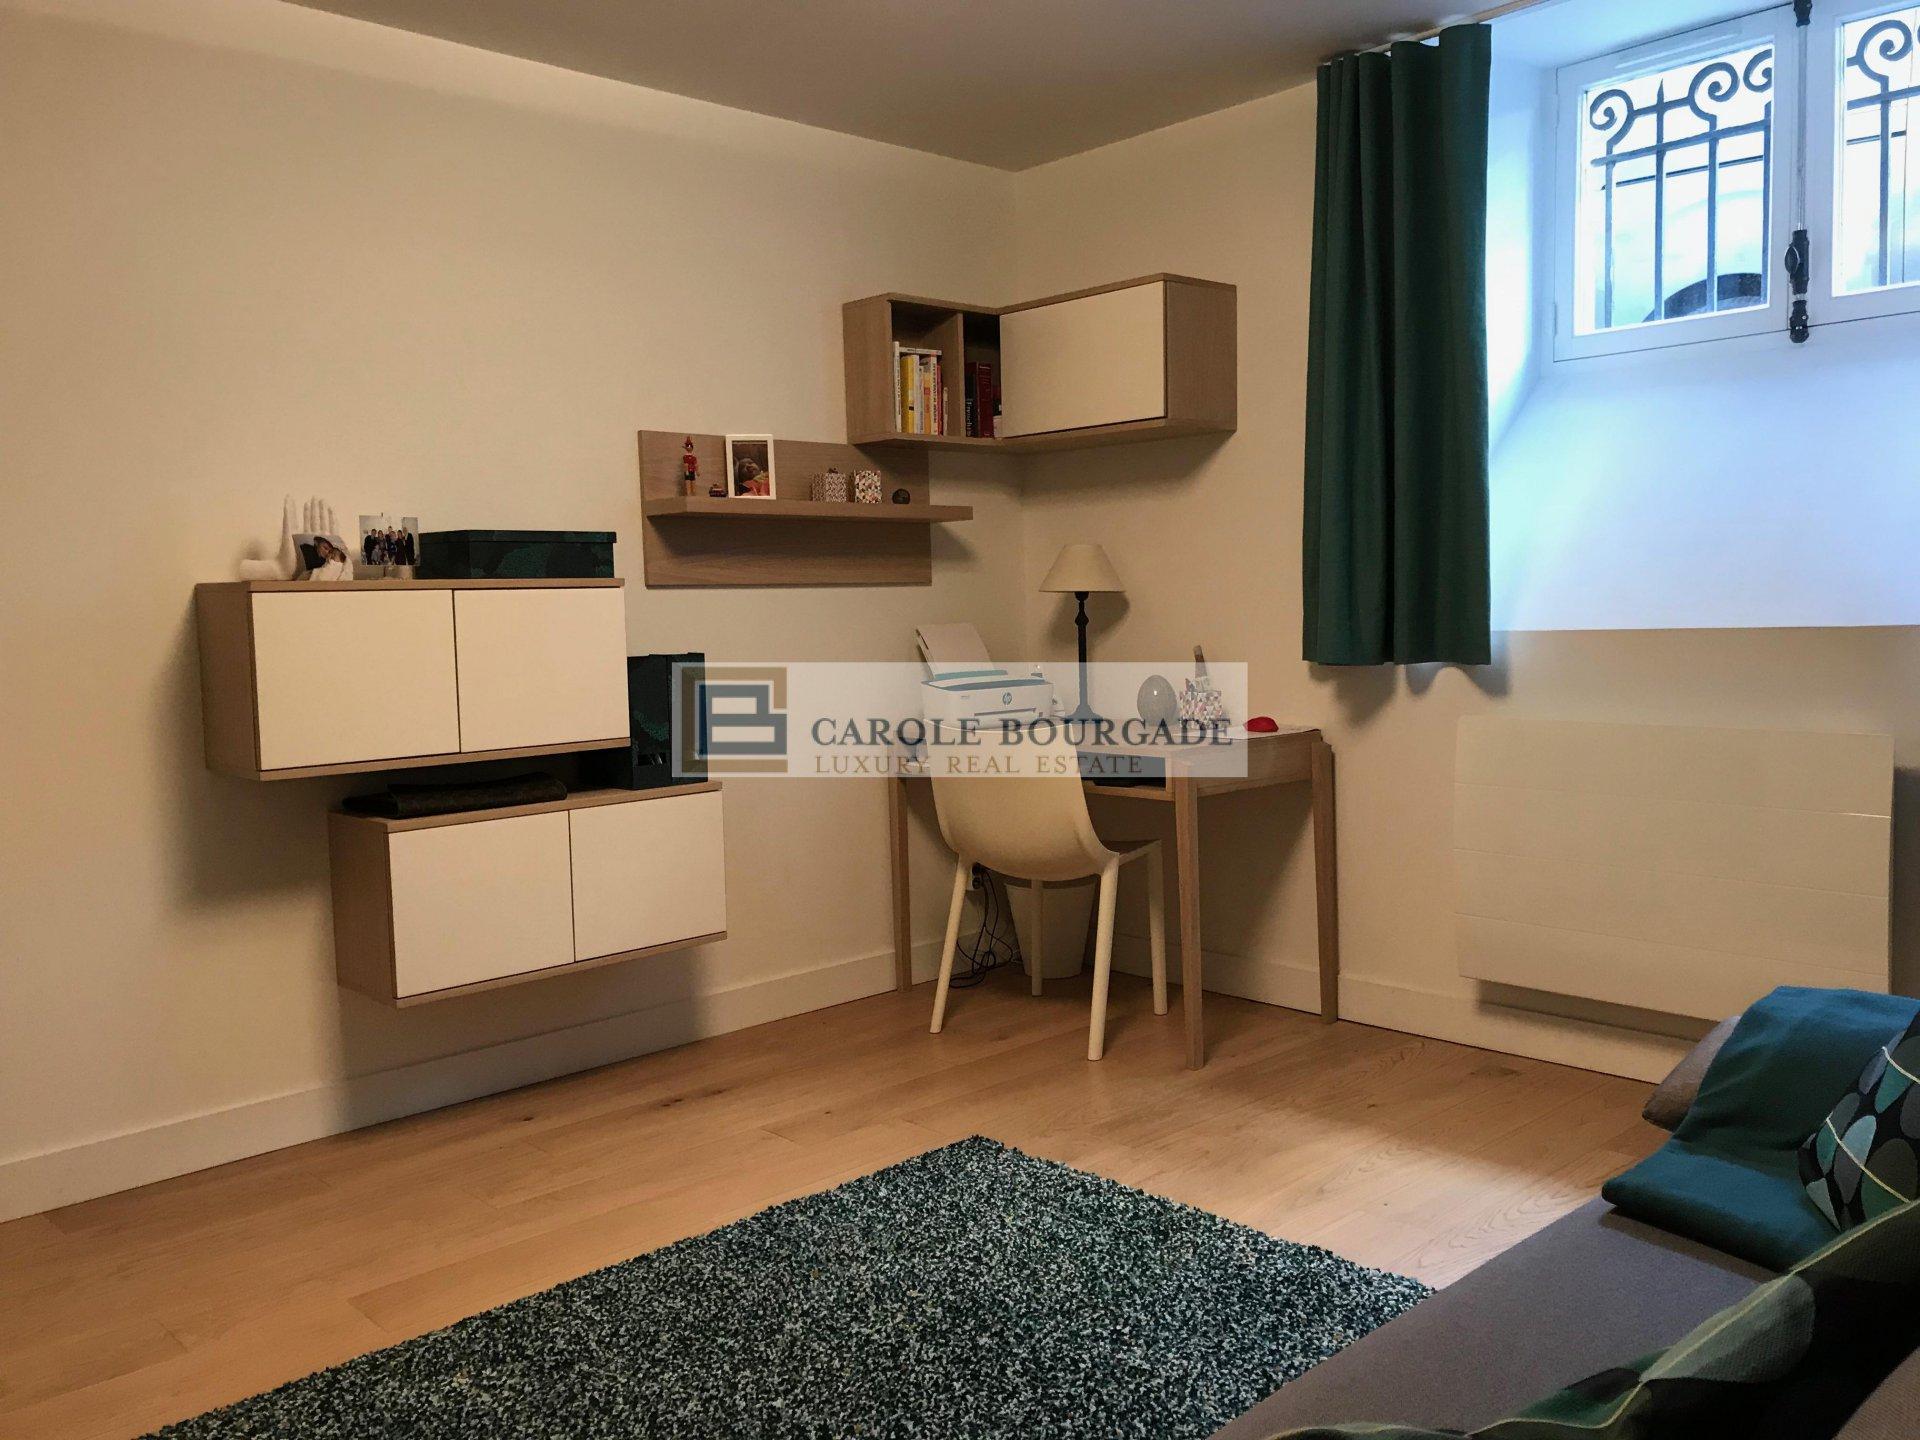 Seasonal rental Apartment - Bordeaux Saint-Seurin